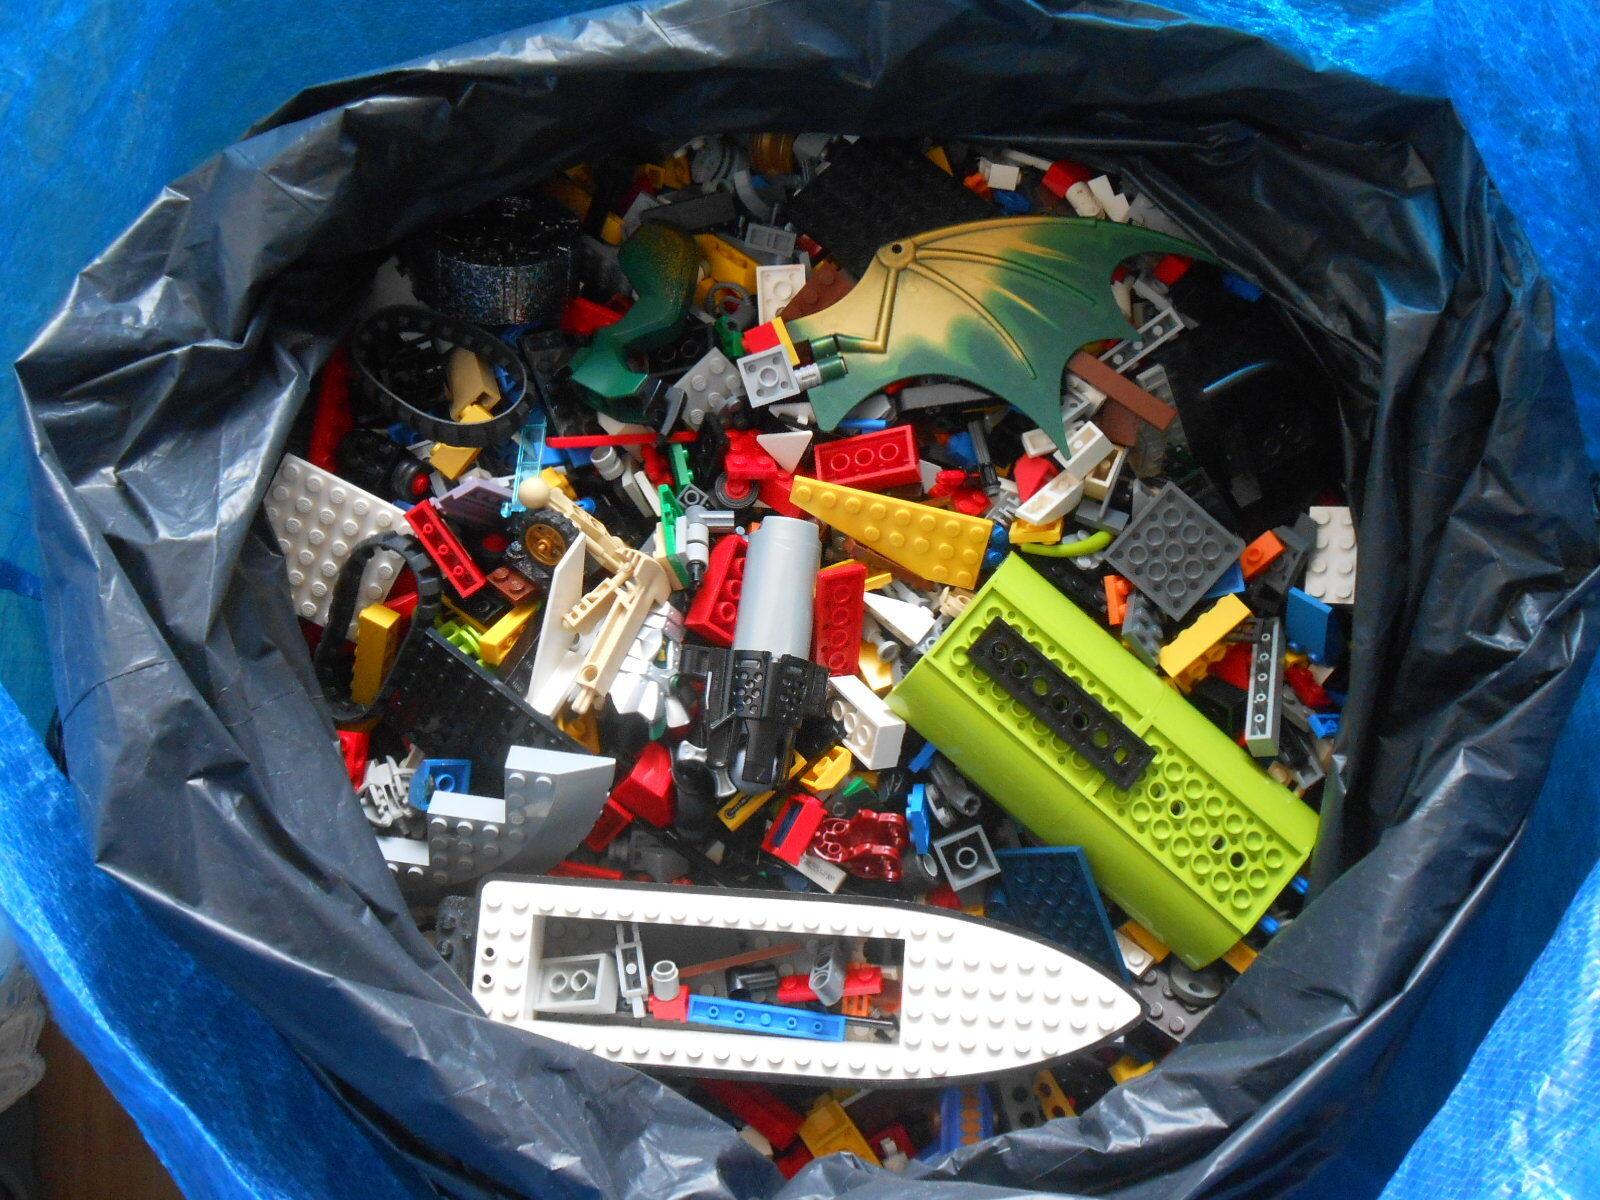 Lego Konvolut-Gemischt überwiegend Star Wars,Technik,City ca. 10 kg   SAUBER